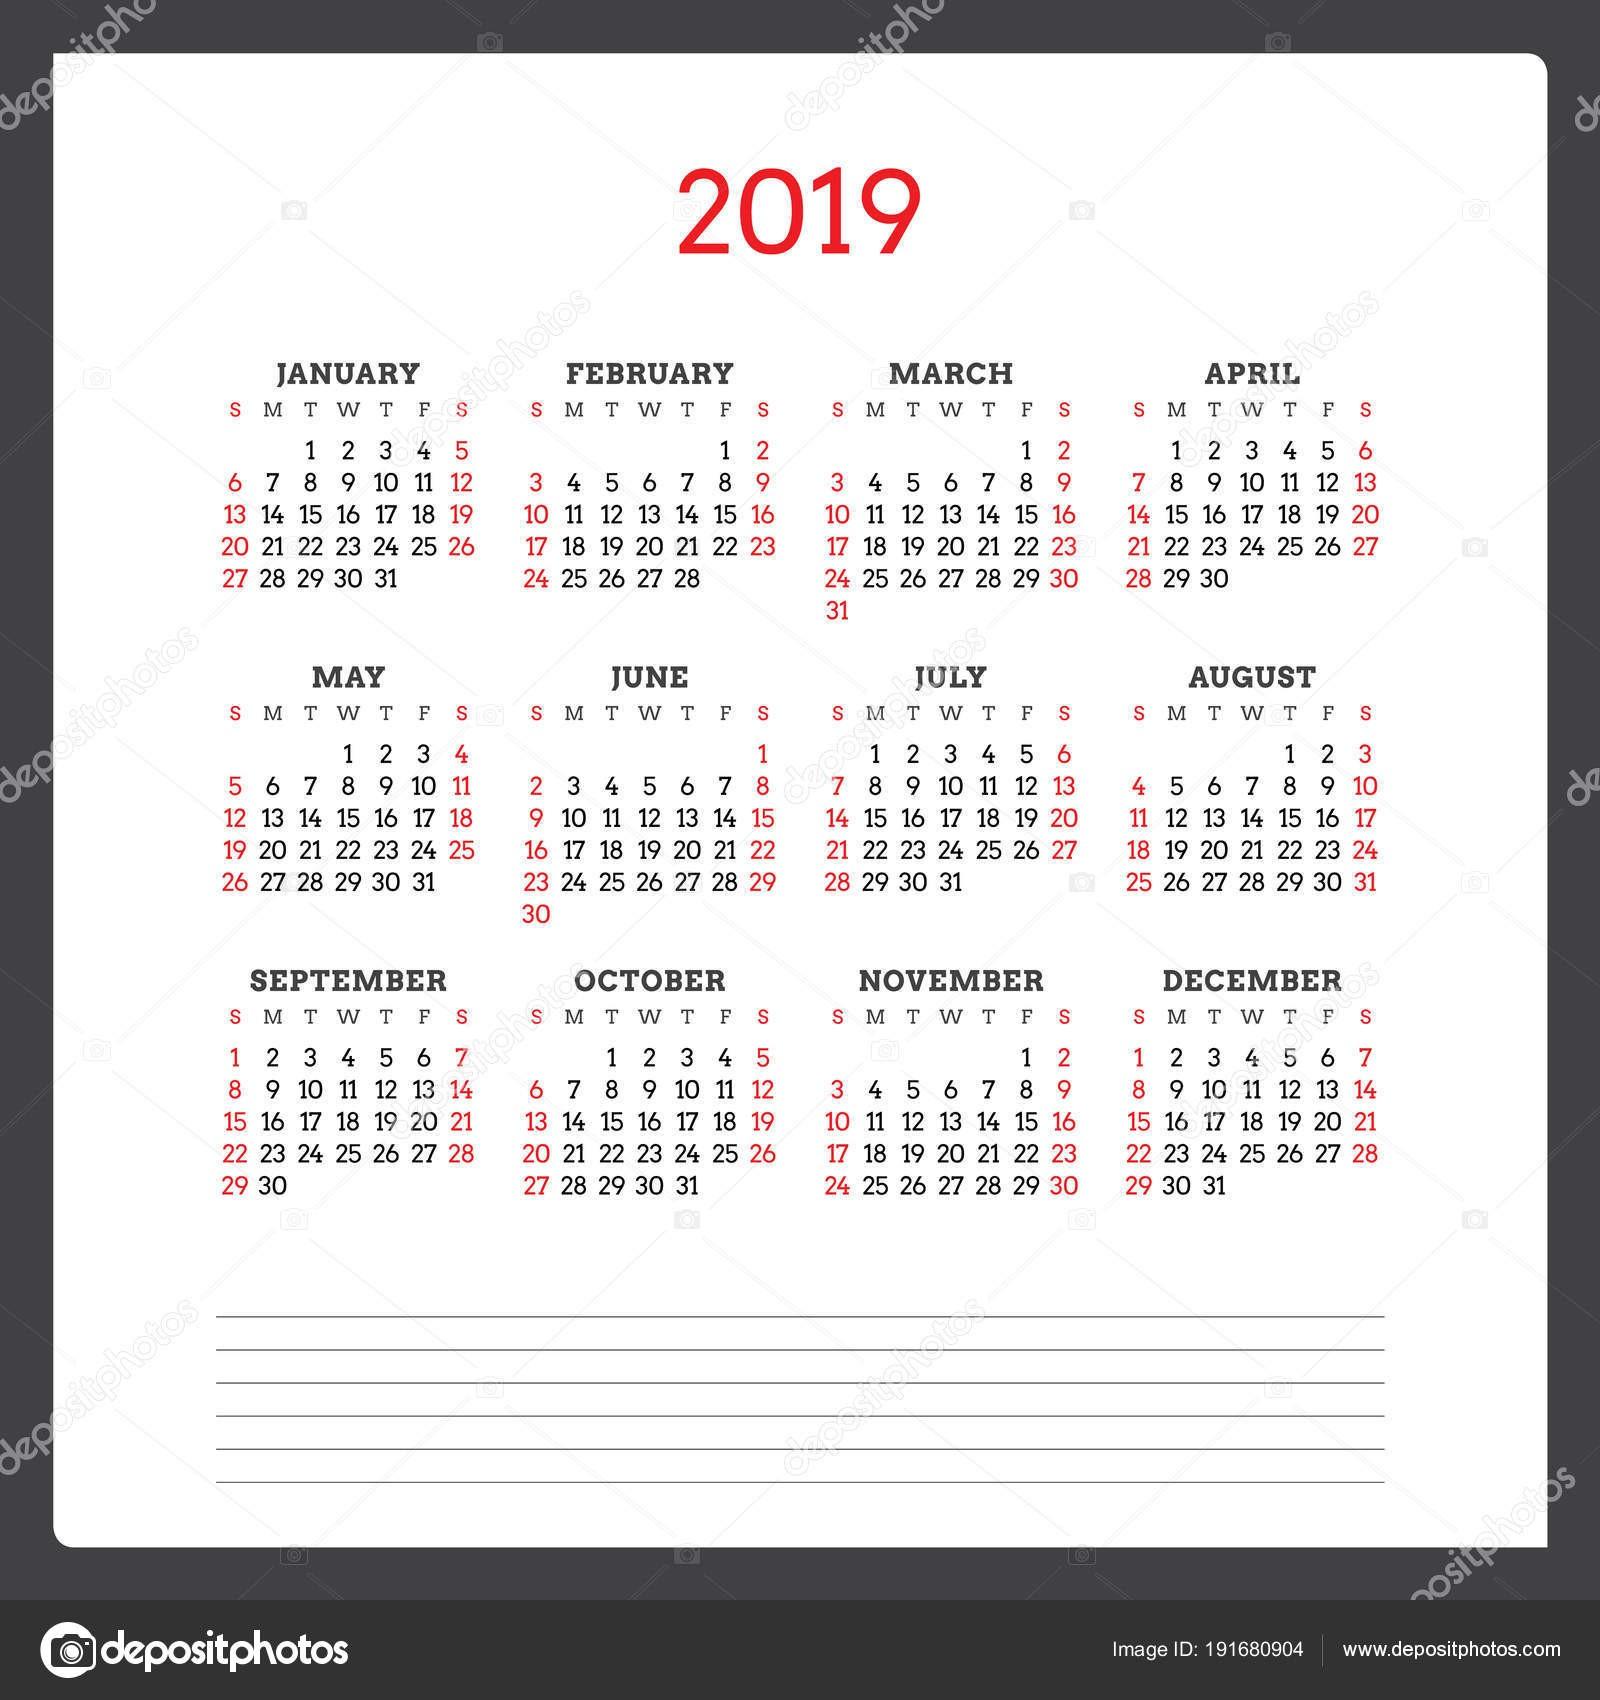 Calendario 2019 Y 2019 Para Imprimir Más Reciente Kalendář Na Rok 2019 T½den Začná V Neděli Åablona Návrhu Å¡ablony Of Calendario 2019 Y 2019 Para Imprimir Más Recientes Preschool Calendar Template Printables Create A Calendar May